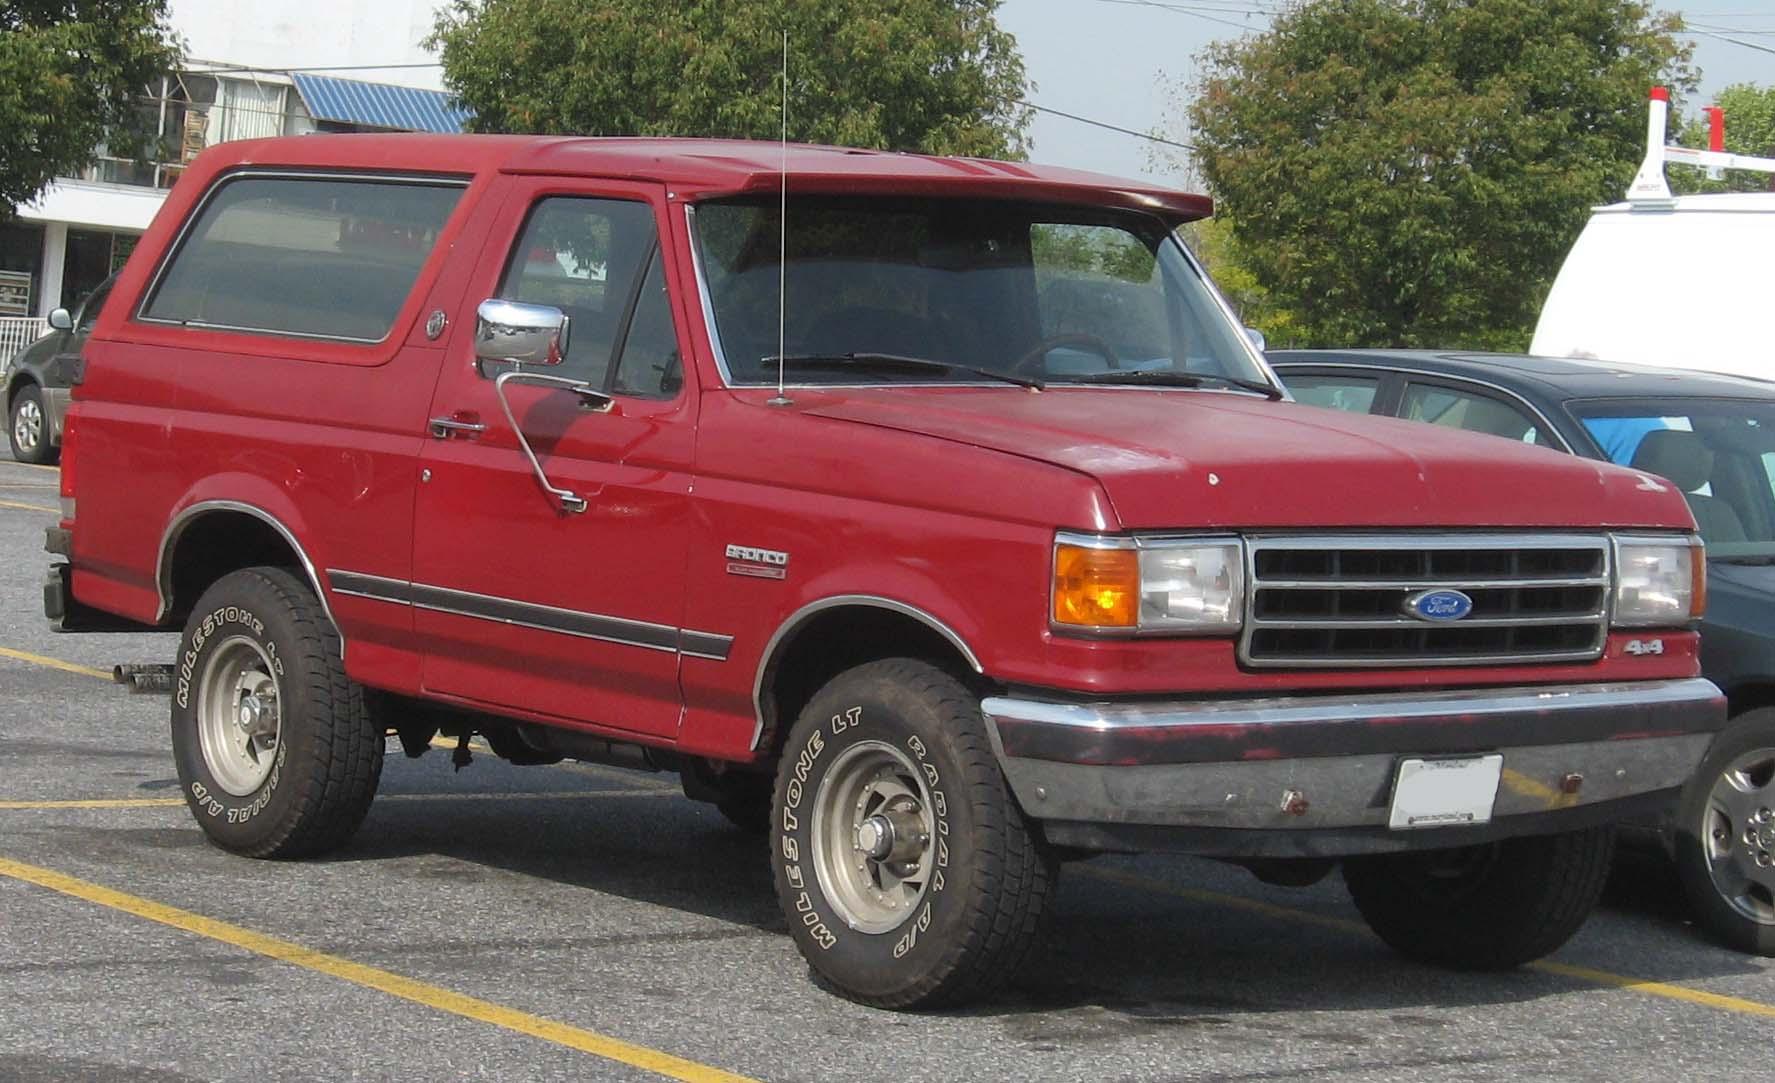 87 ford bronco truck repair advice. Black Bedroom Furniture Sets. Home Design Ideas